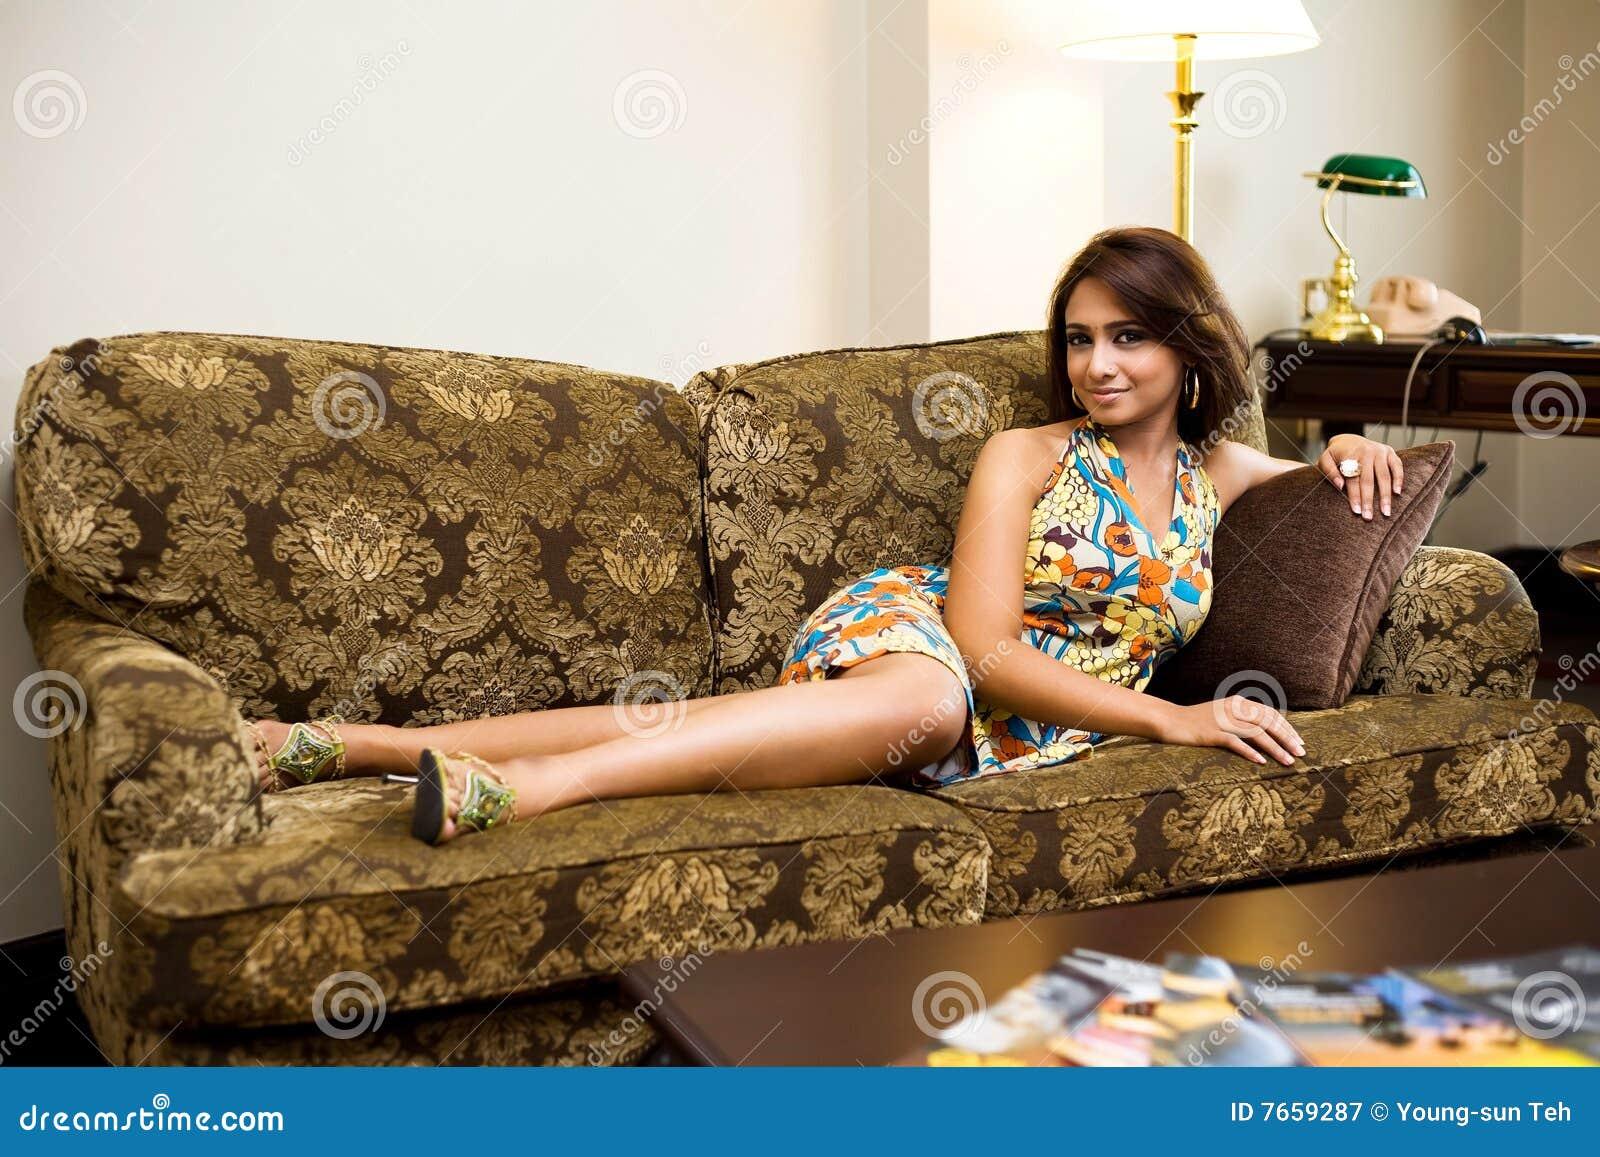 Saint lucas hindu single women